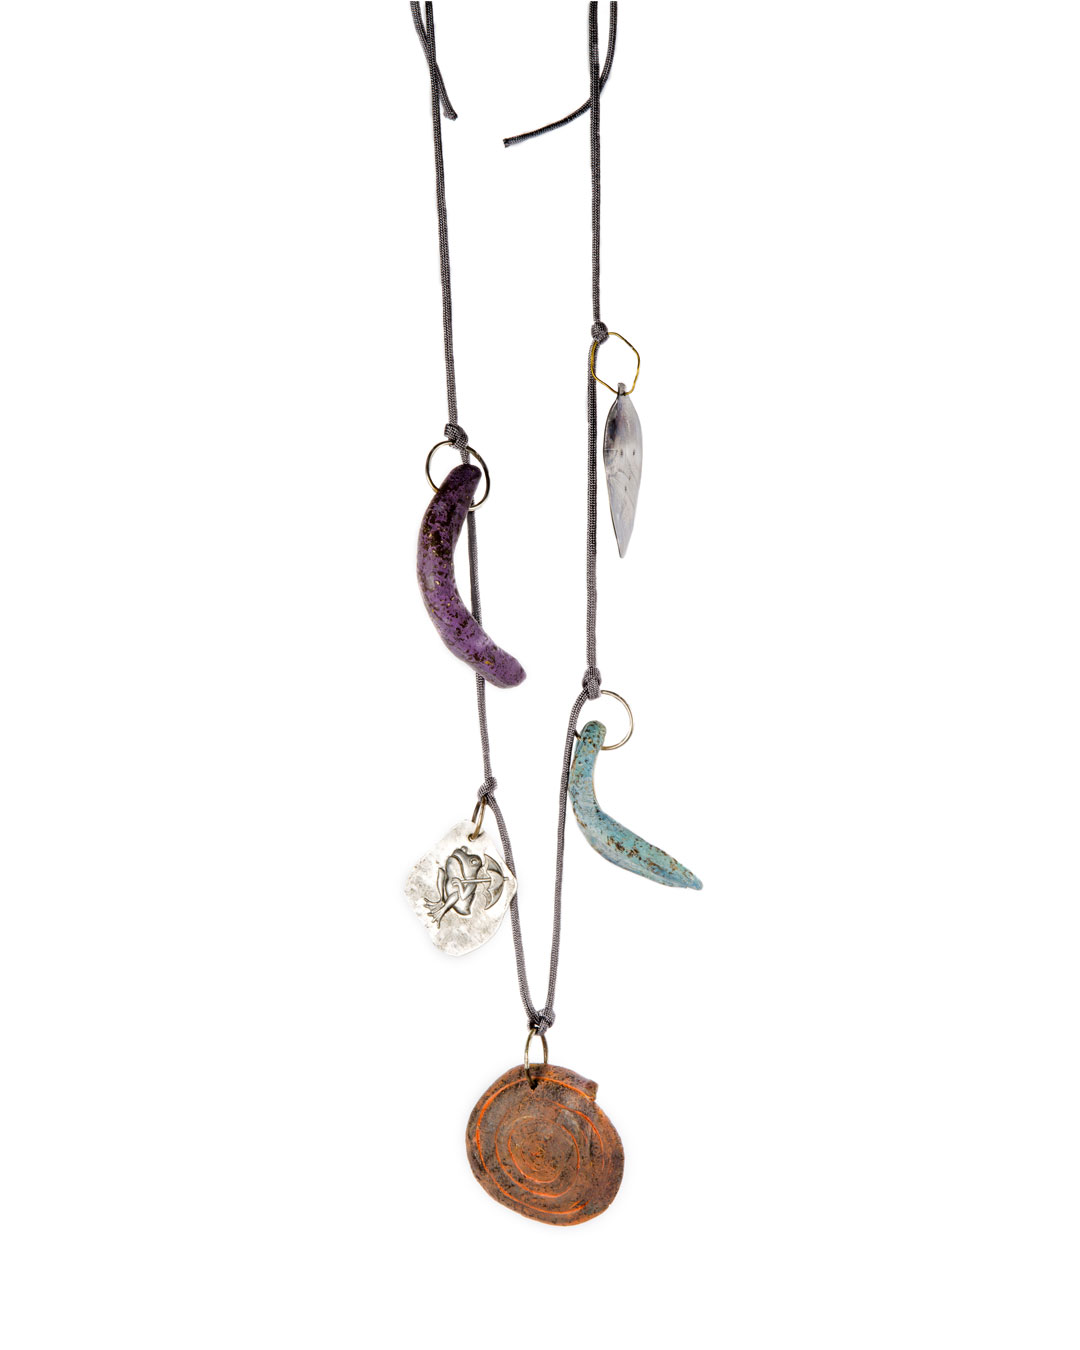 Julia Walter, Beach Necklace, 2019, halssieraad; geverfd klei, zilver, nylon koord, aluminium, staal, L 500 mm, € 970